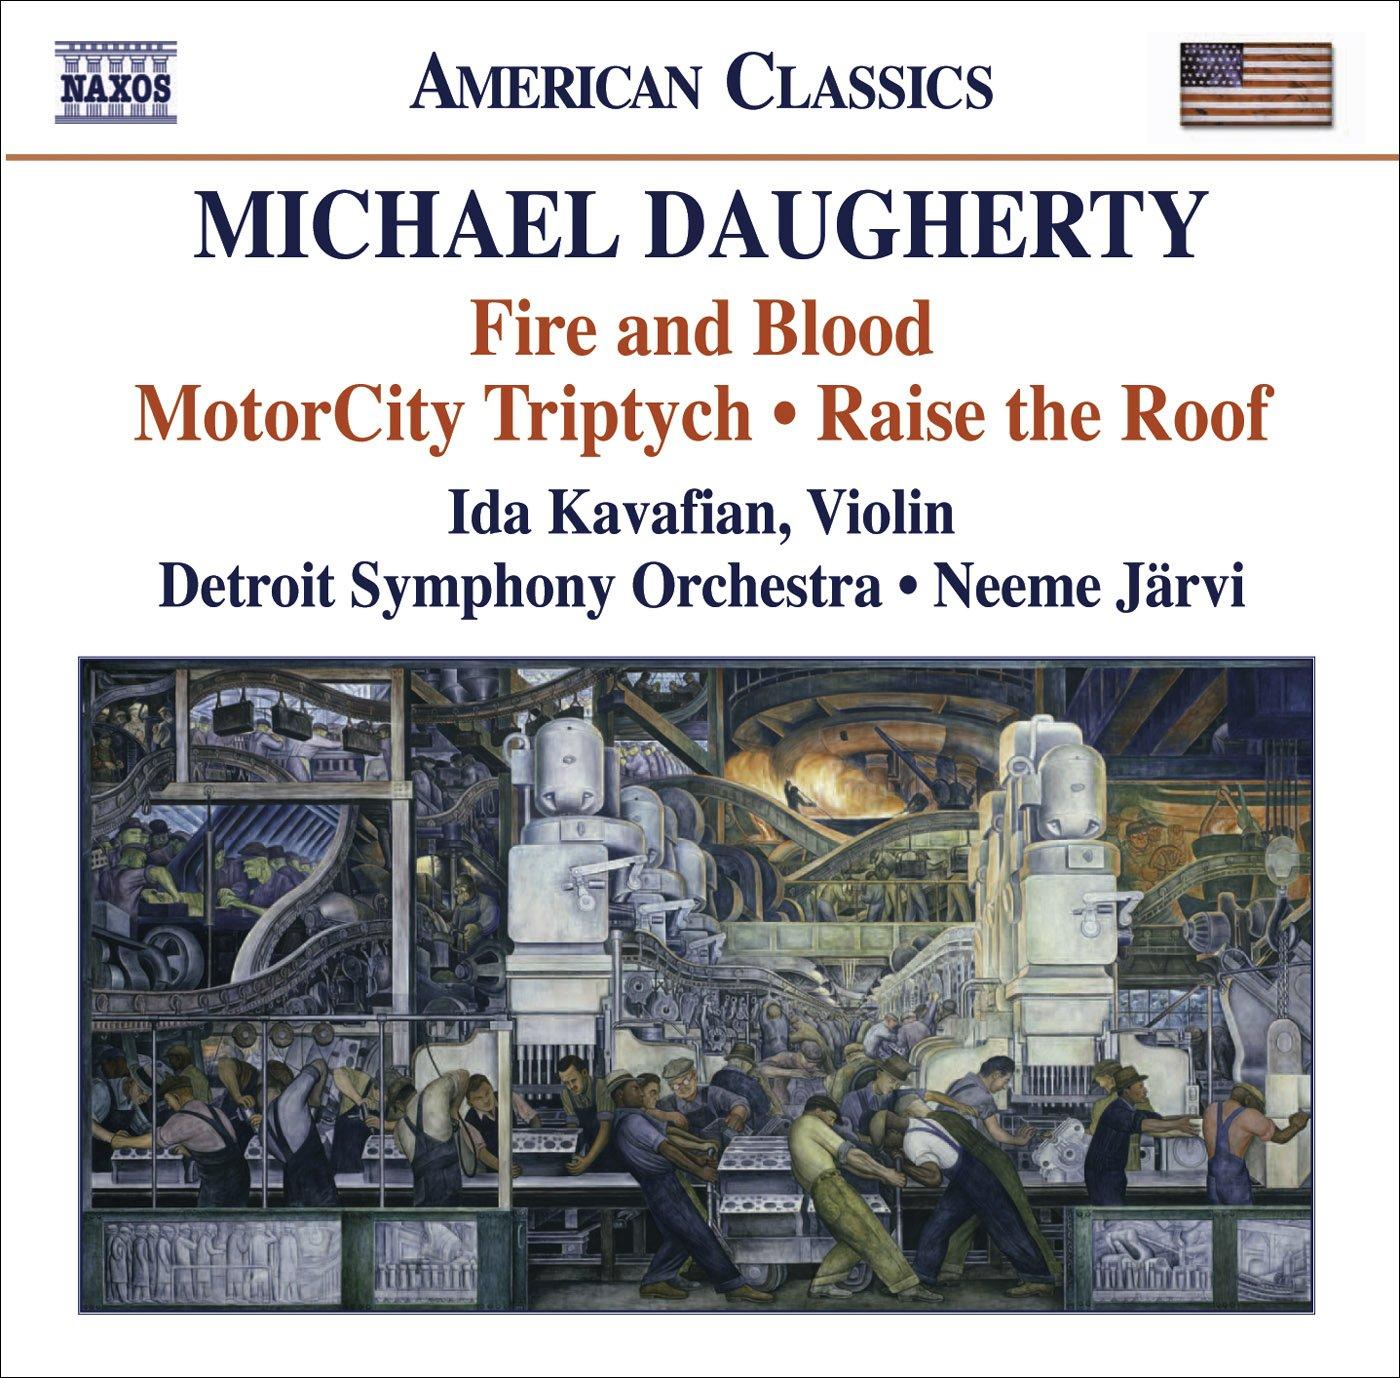 michael daugherty neeme jarvi detroit symphony orchestra ida